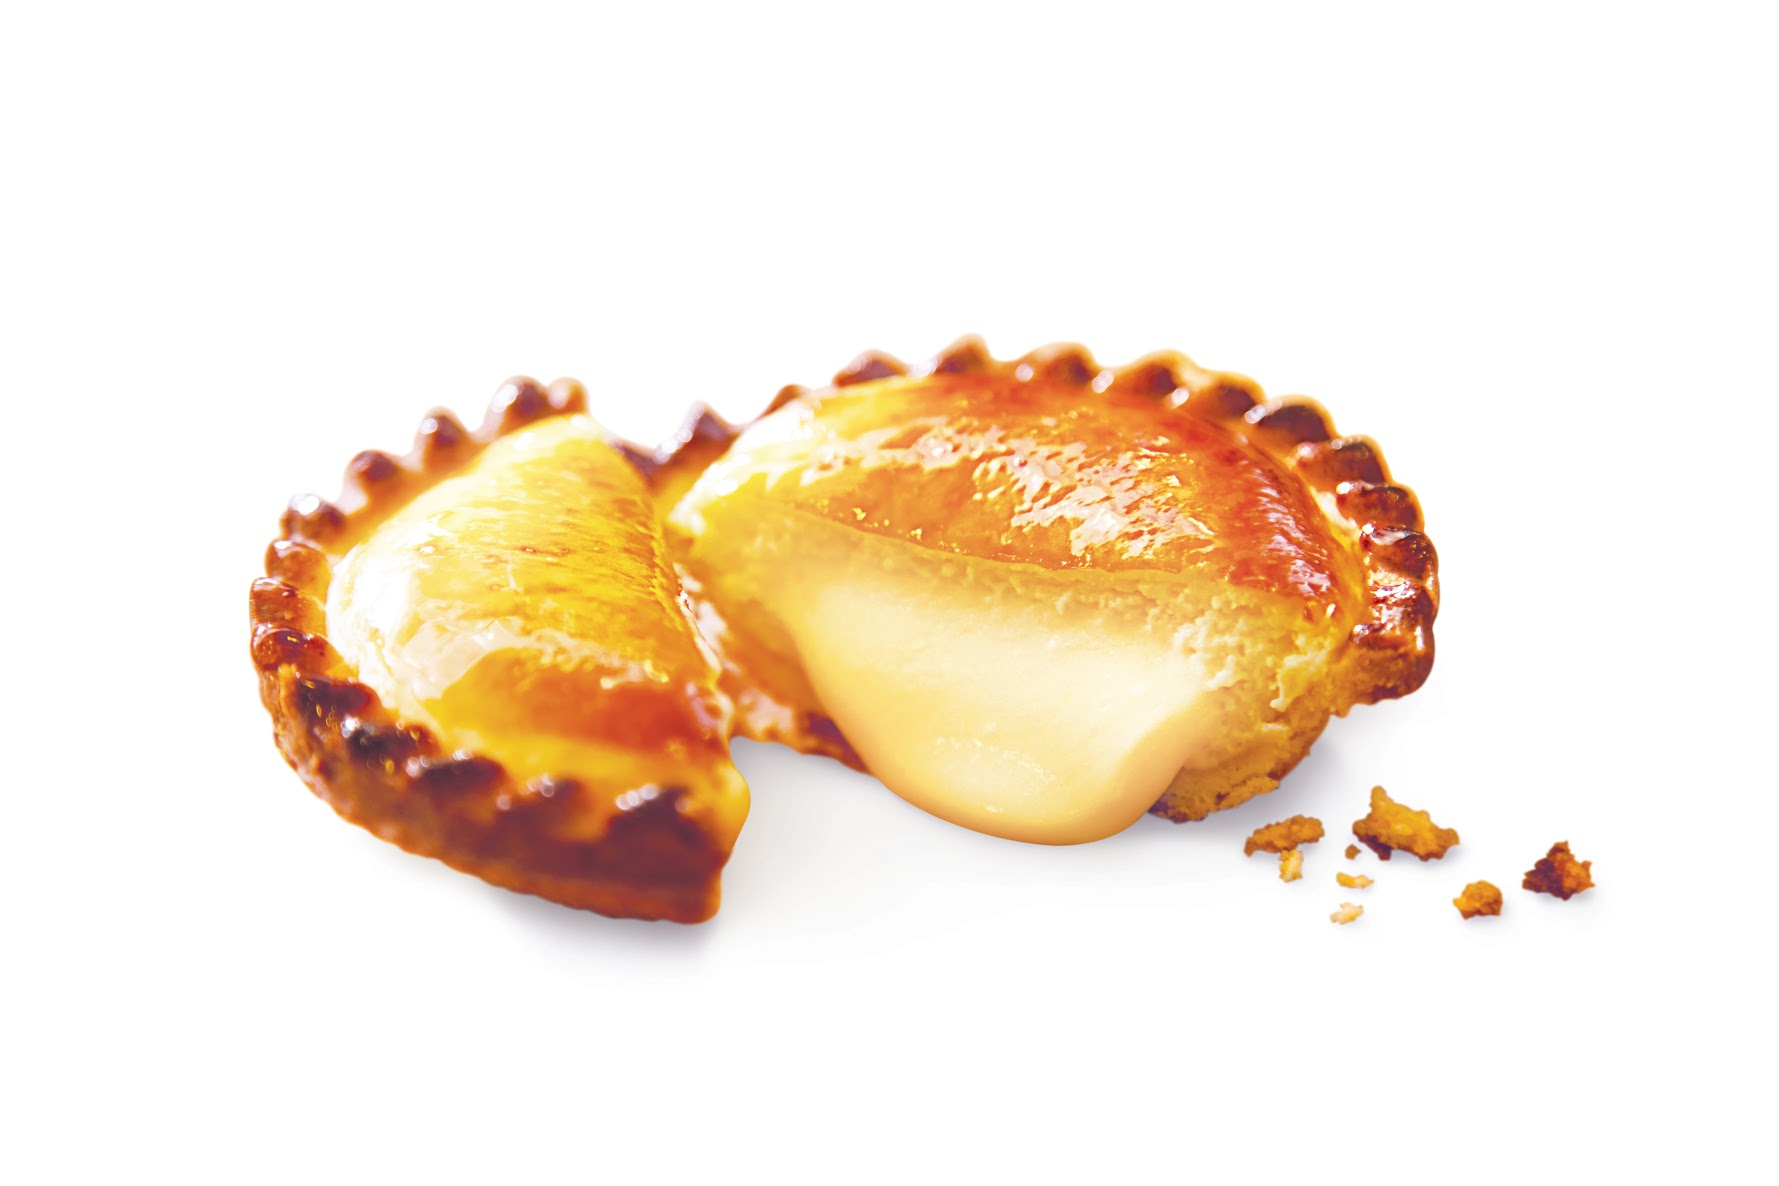 109 BakeryCafe 2